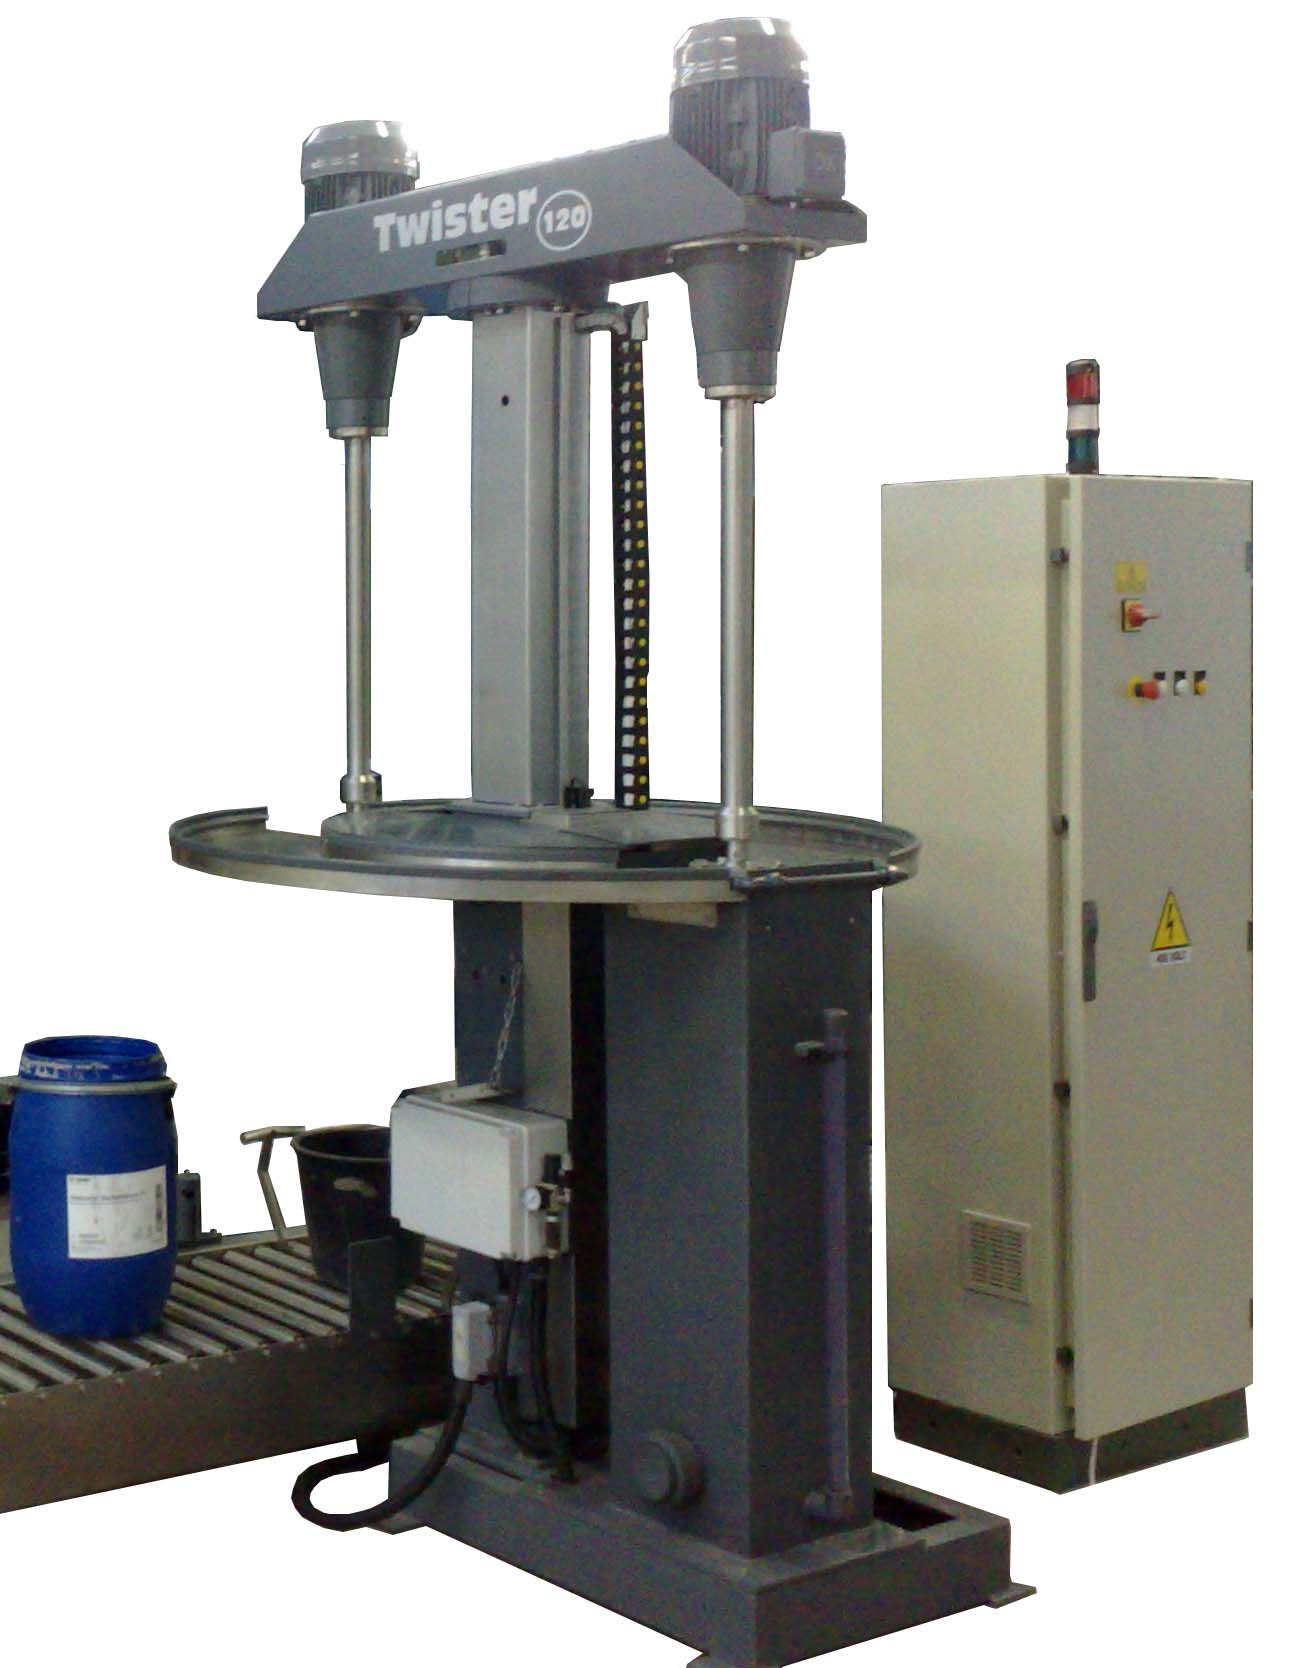 Twister 120 mixing machine